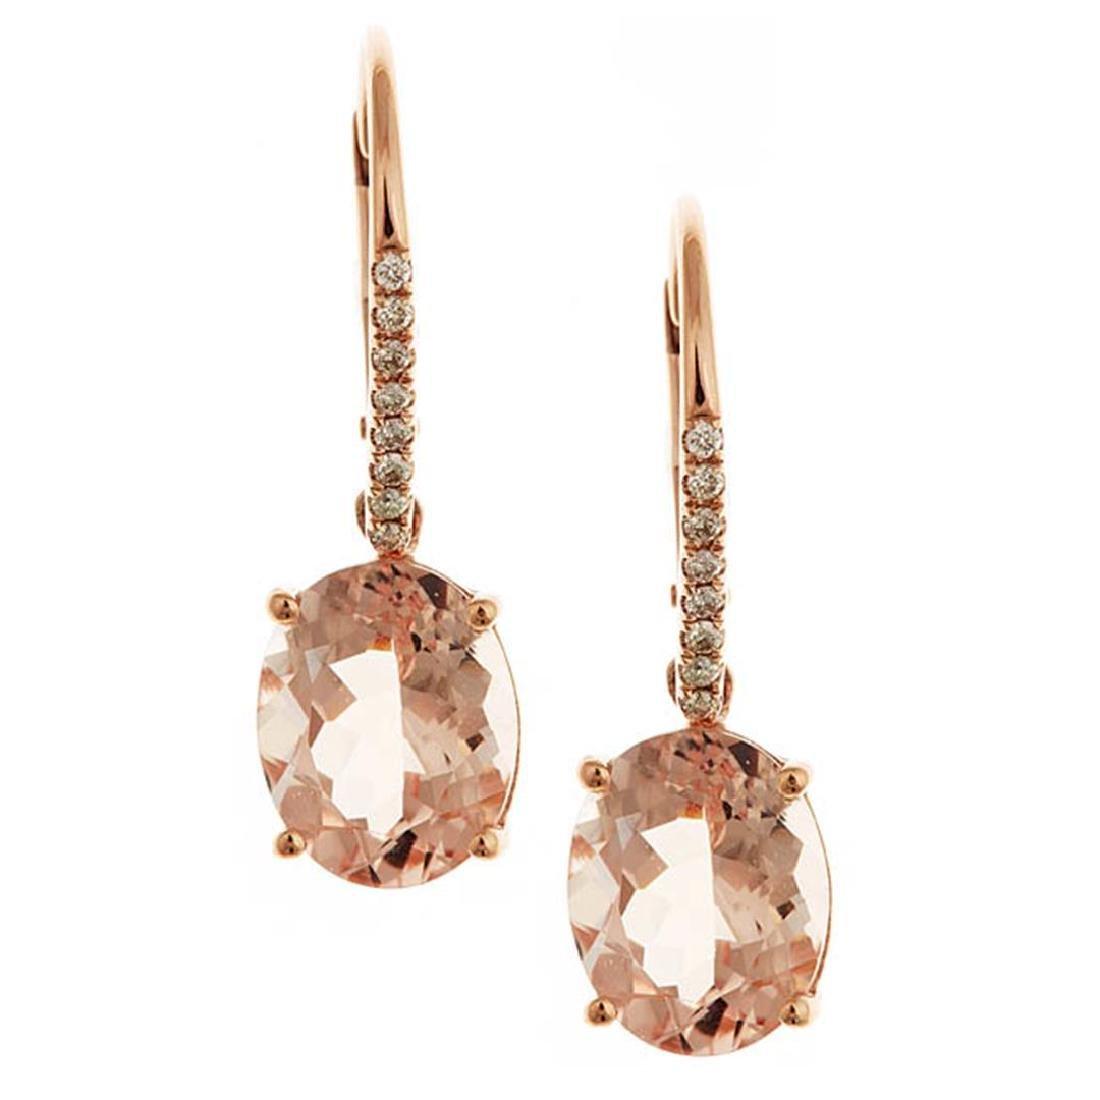 4.5 ctw Morganite and Diamond Earrings - 14KT Rose Gold